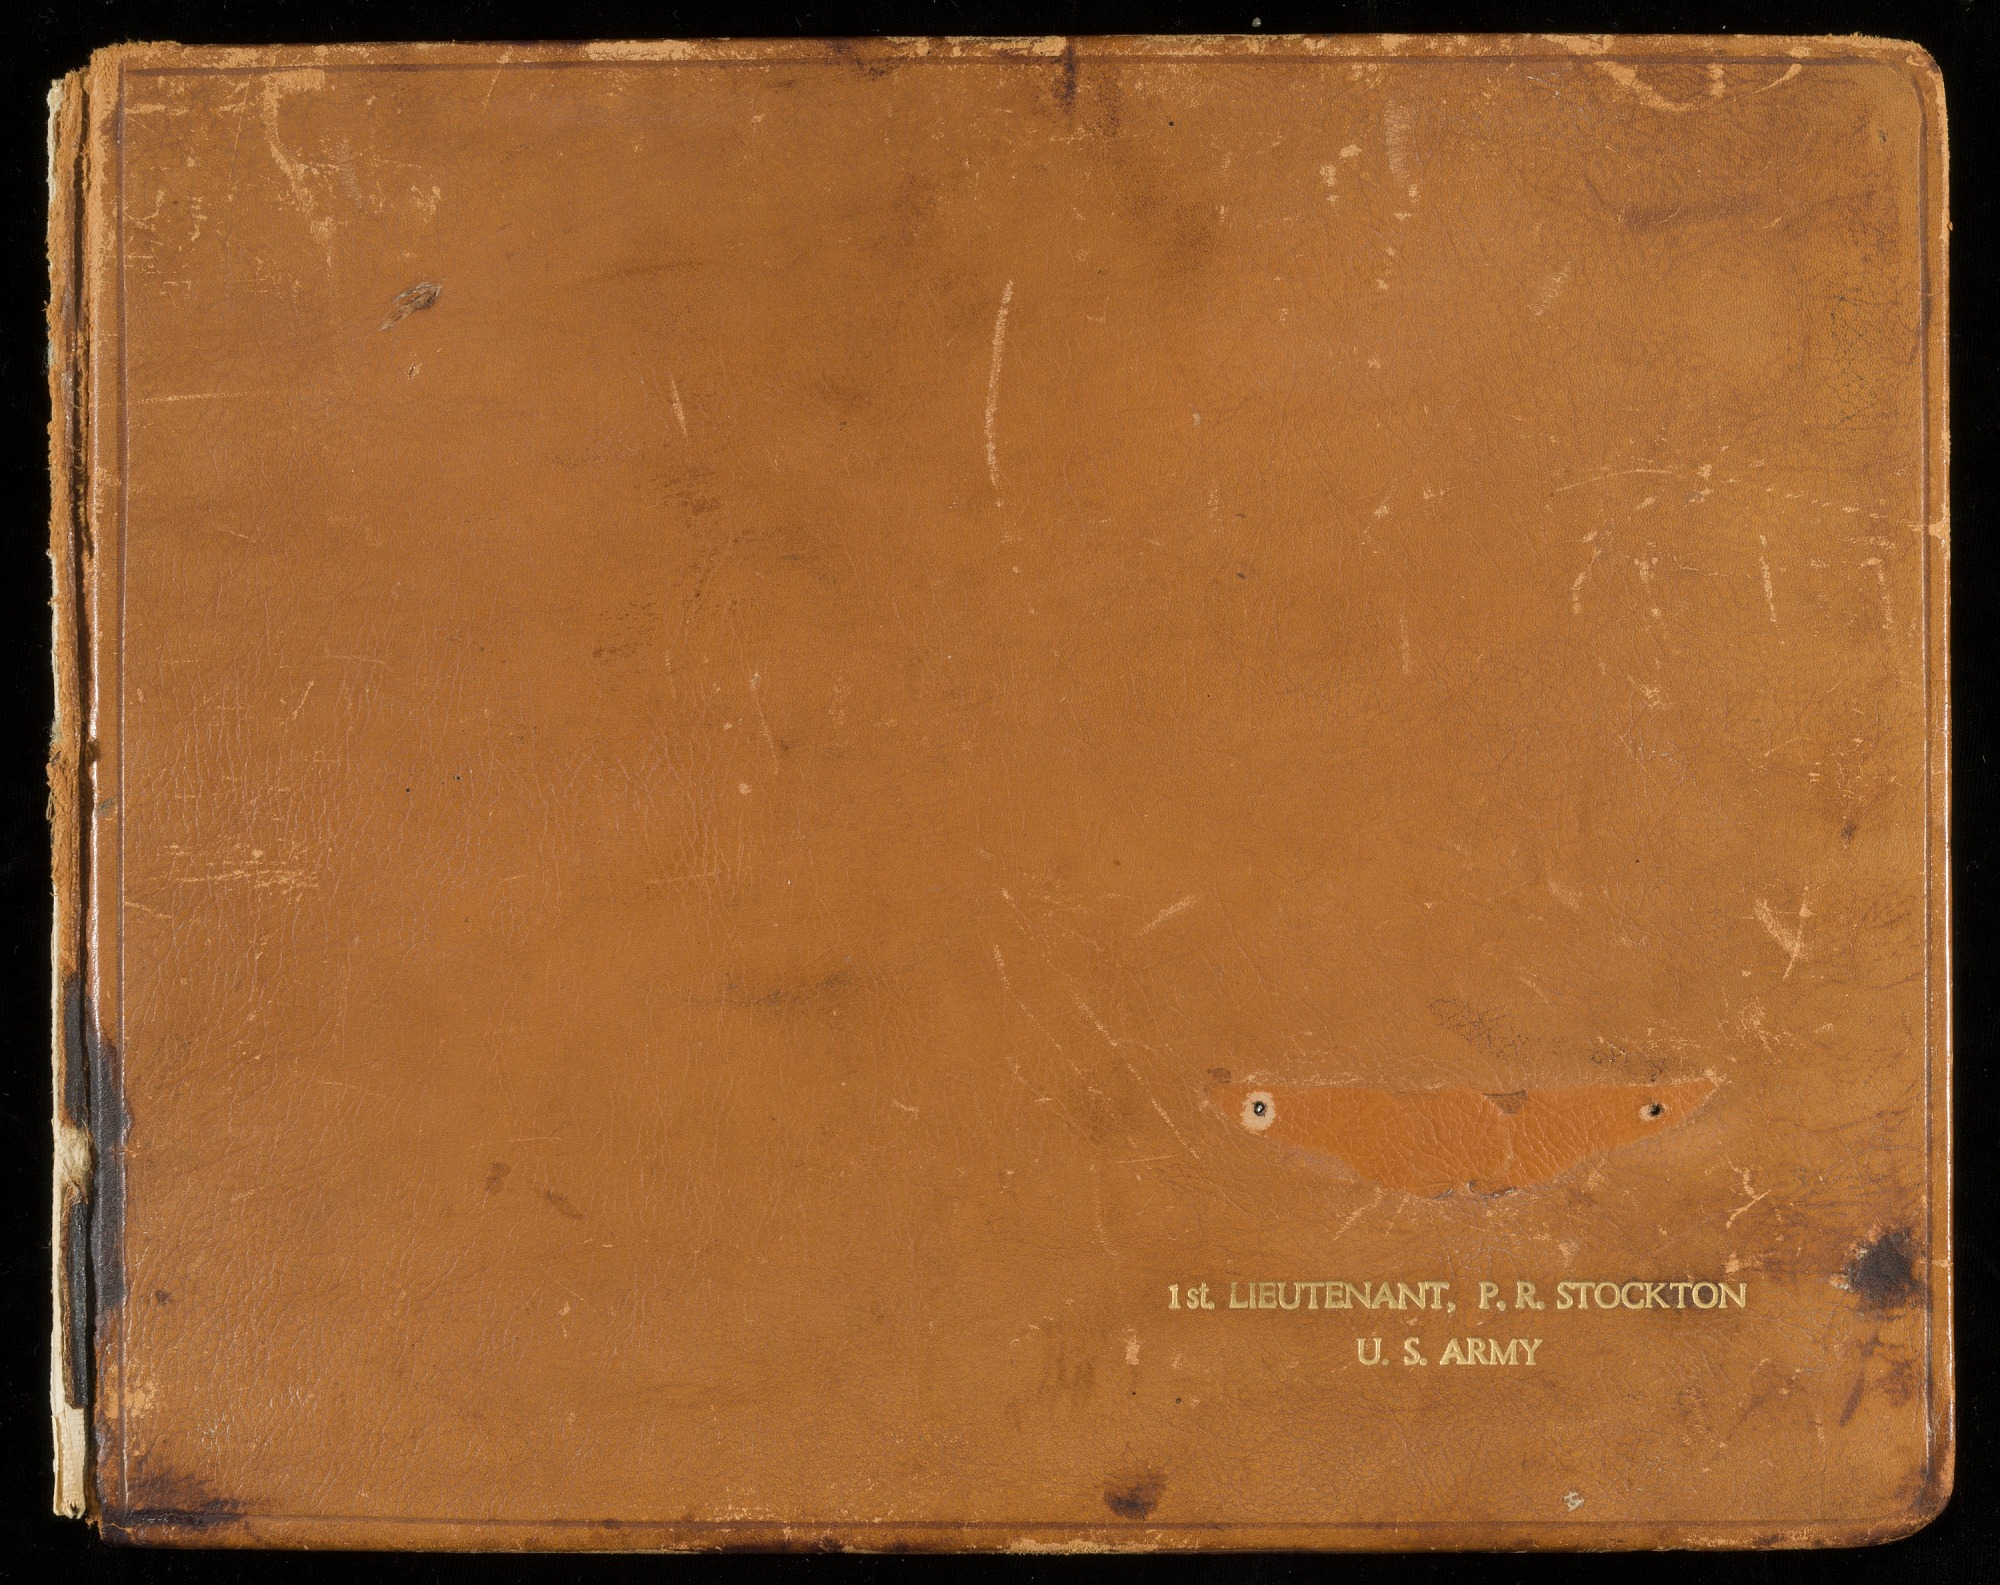 Paul R. Stockton Scrapbook